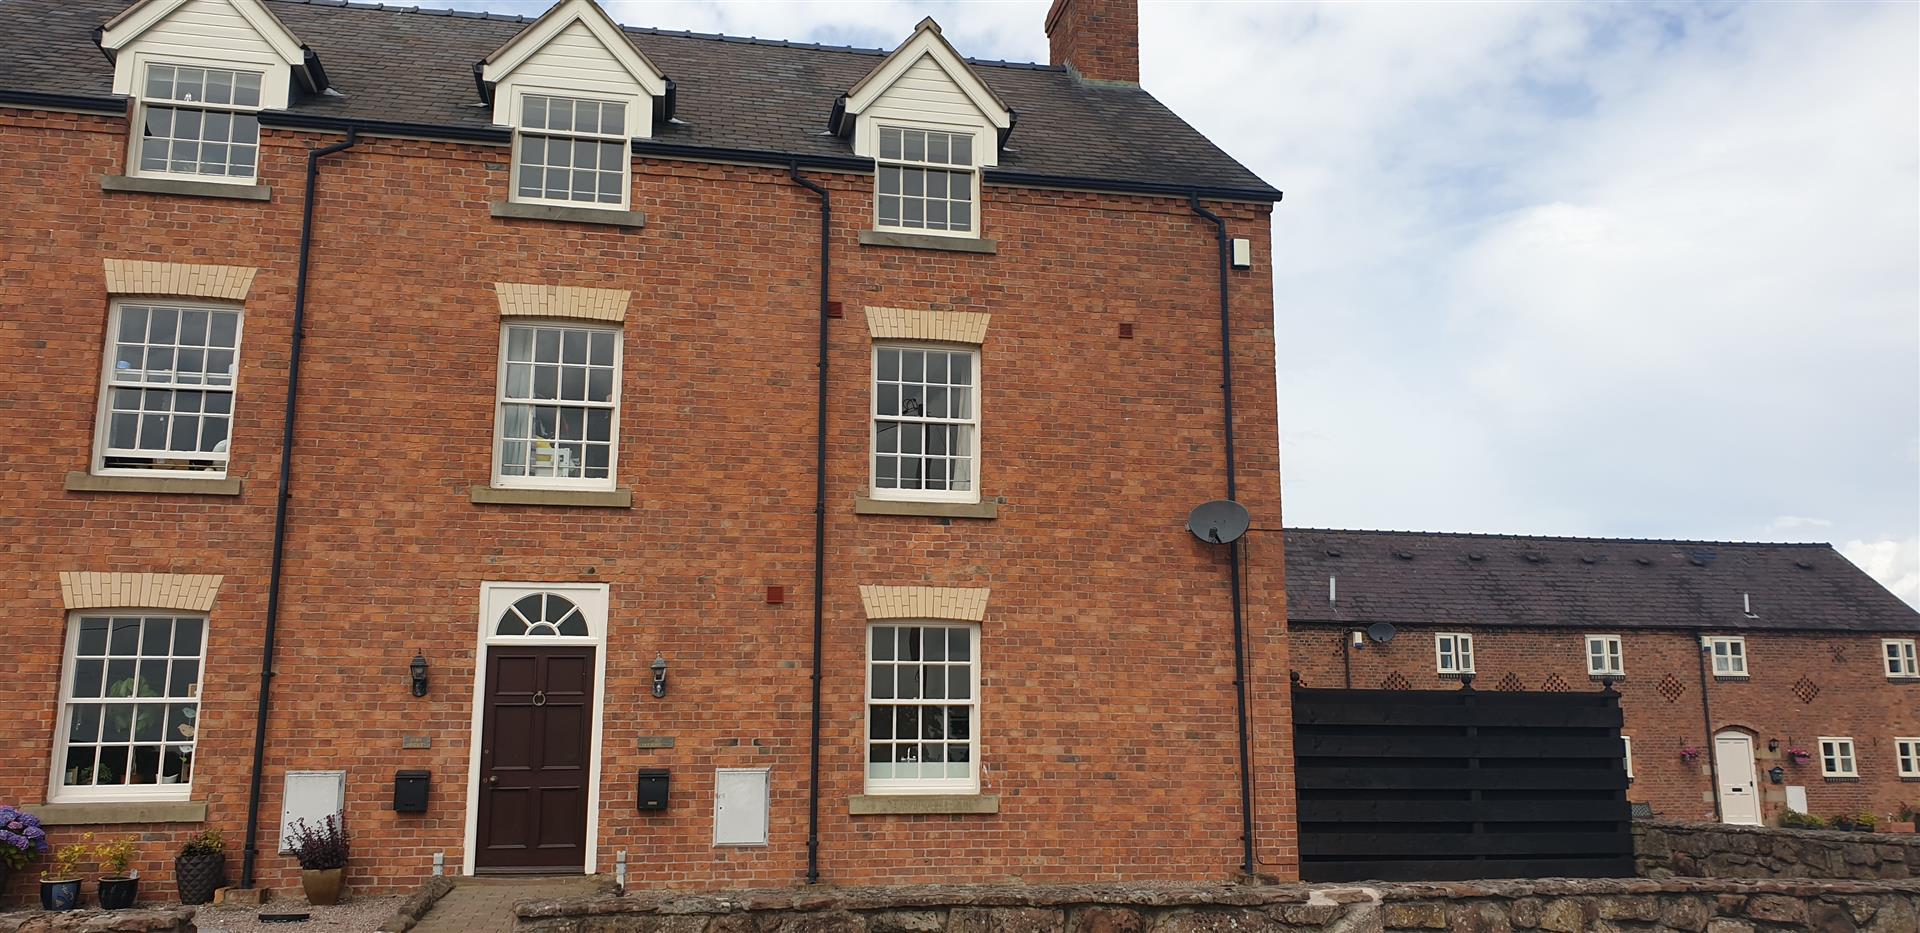 Cloy Farmhouse, Bangor On Dee, Wrexham, LL13 0DJ